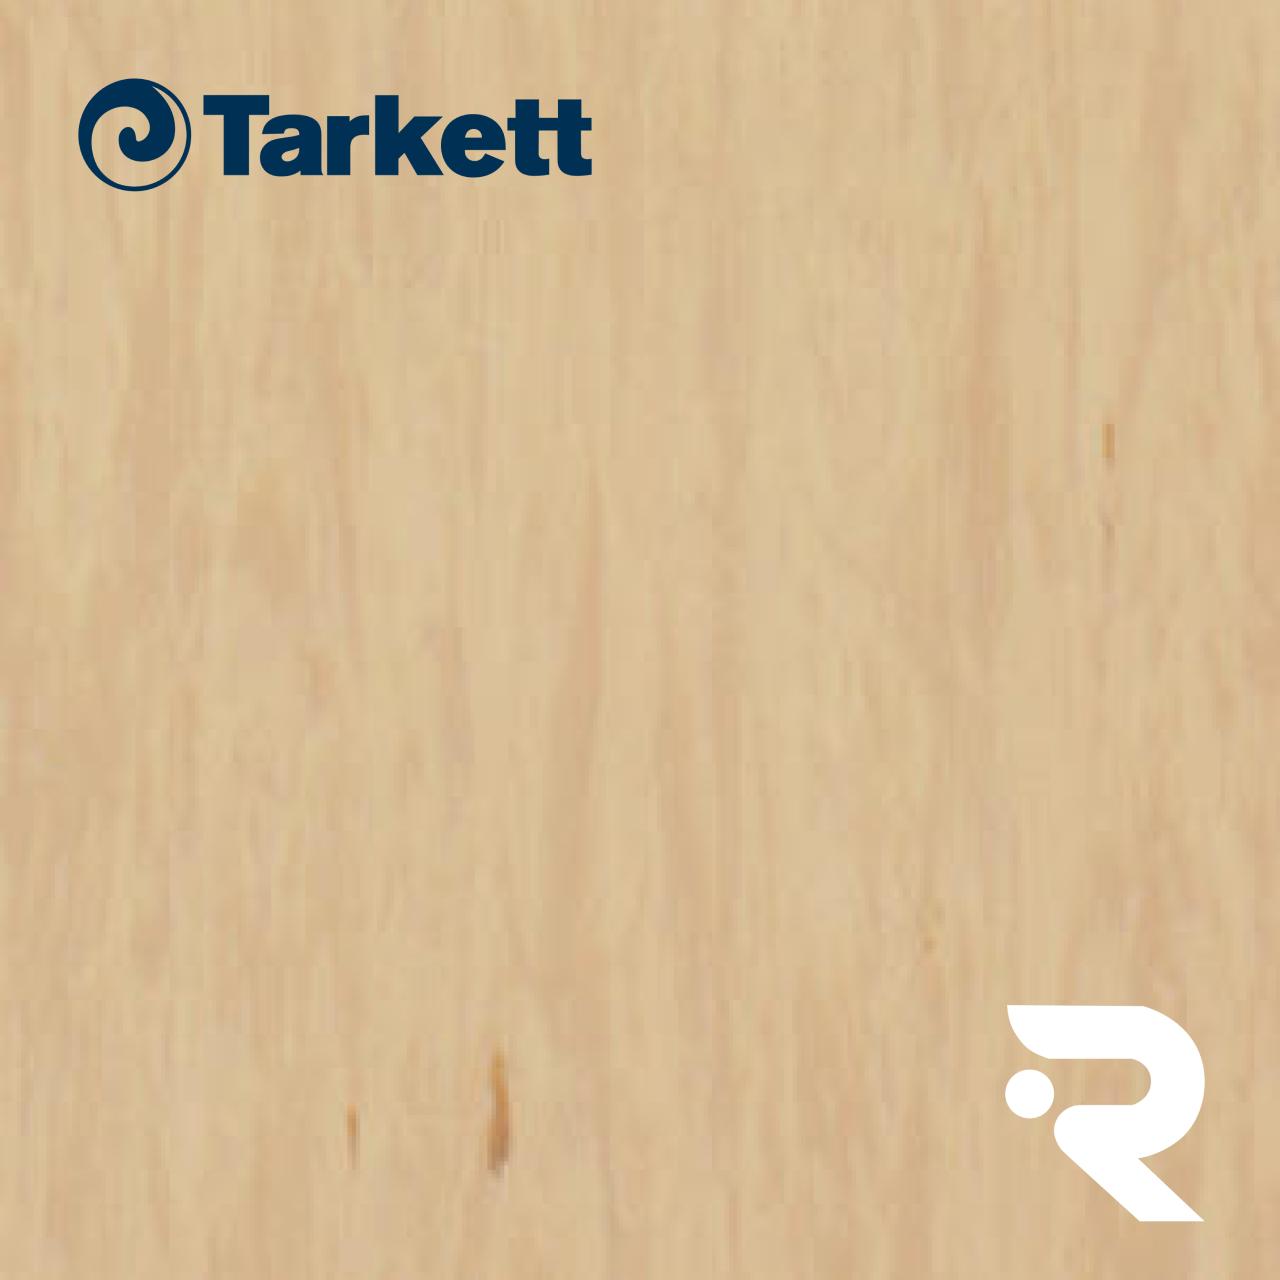 🏫 Гомогенний лінолеум Tarkett | Standard SANDSTONE 0484 | Standard Plus 2.0 mm | 2 х 23 м